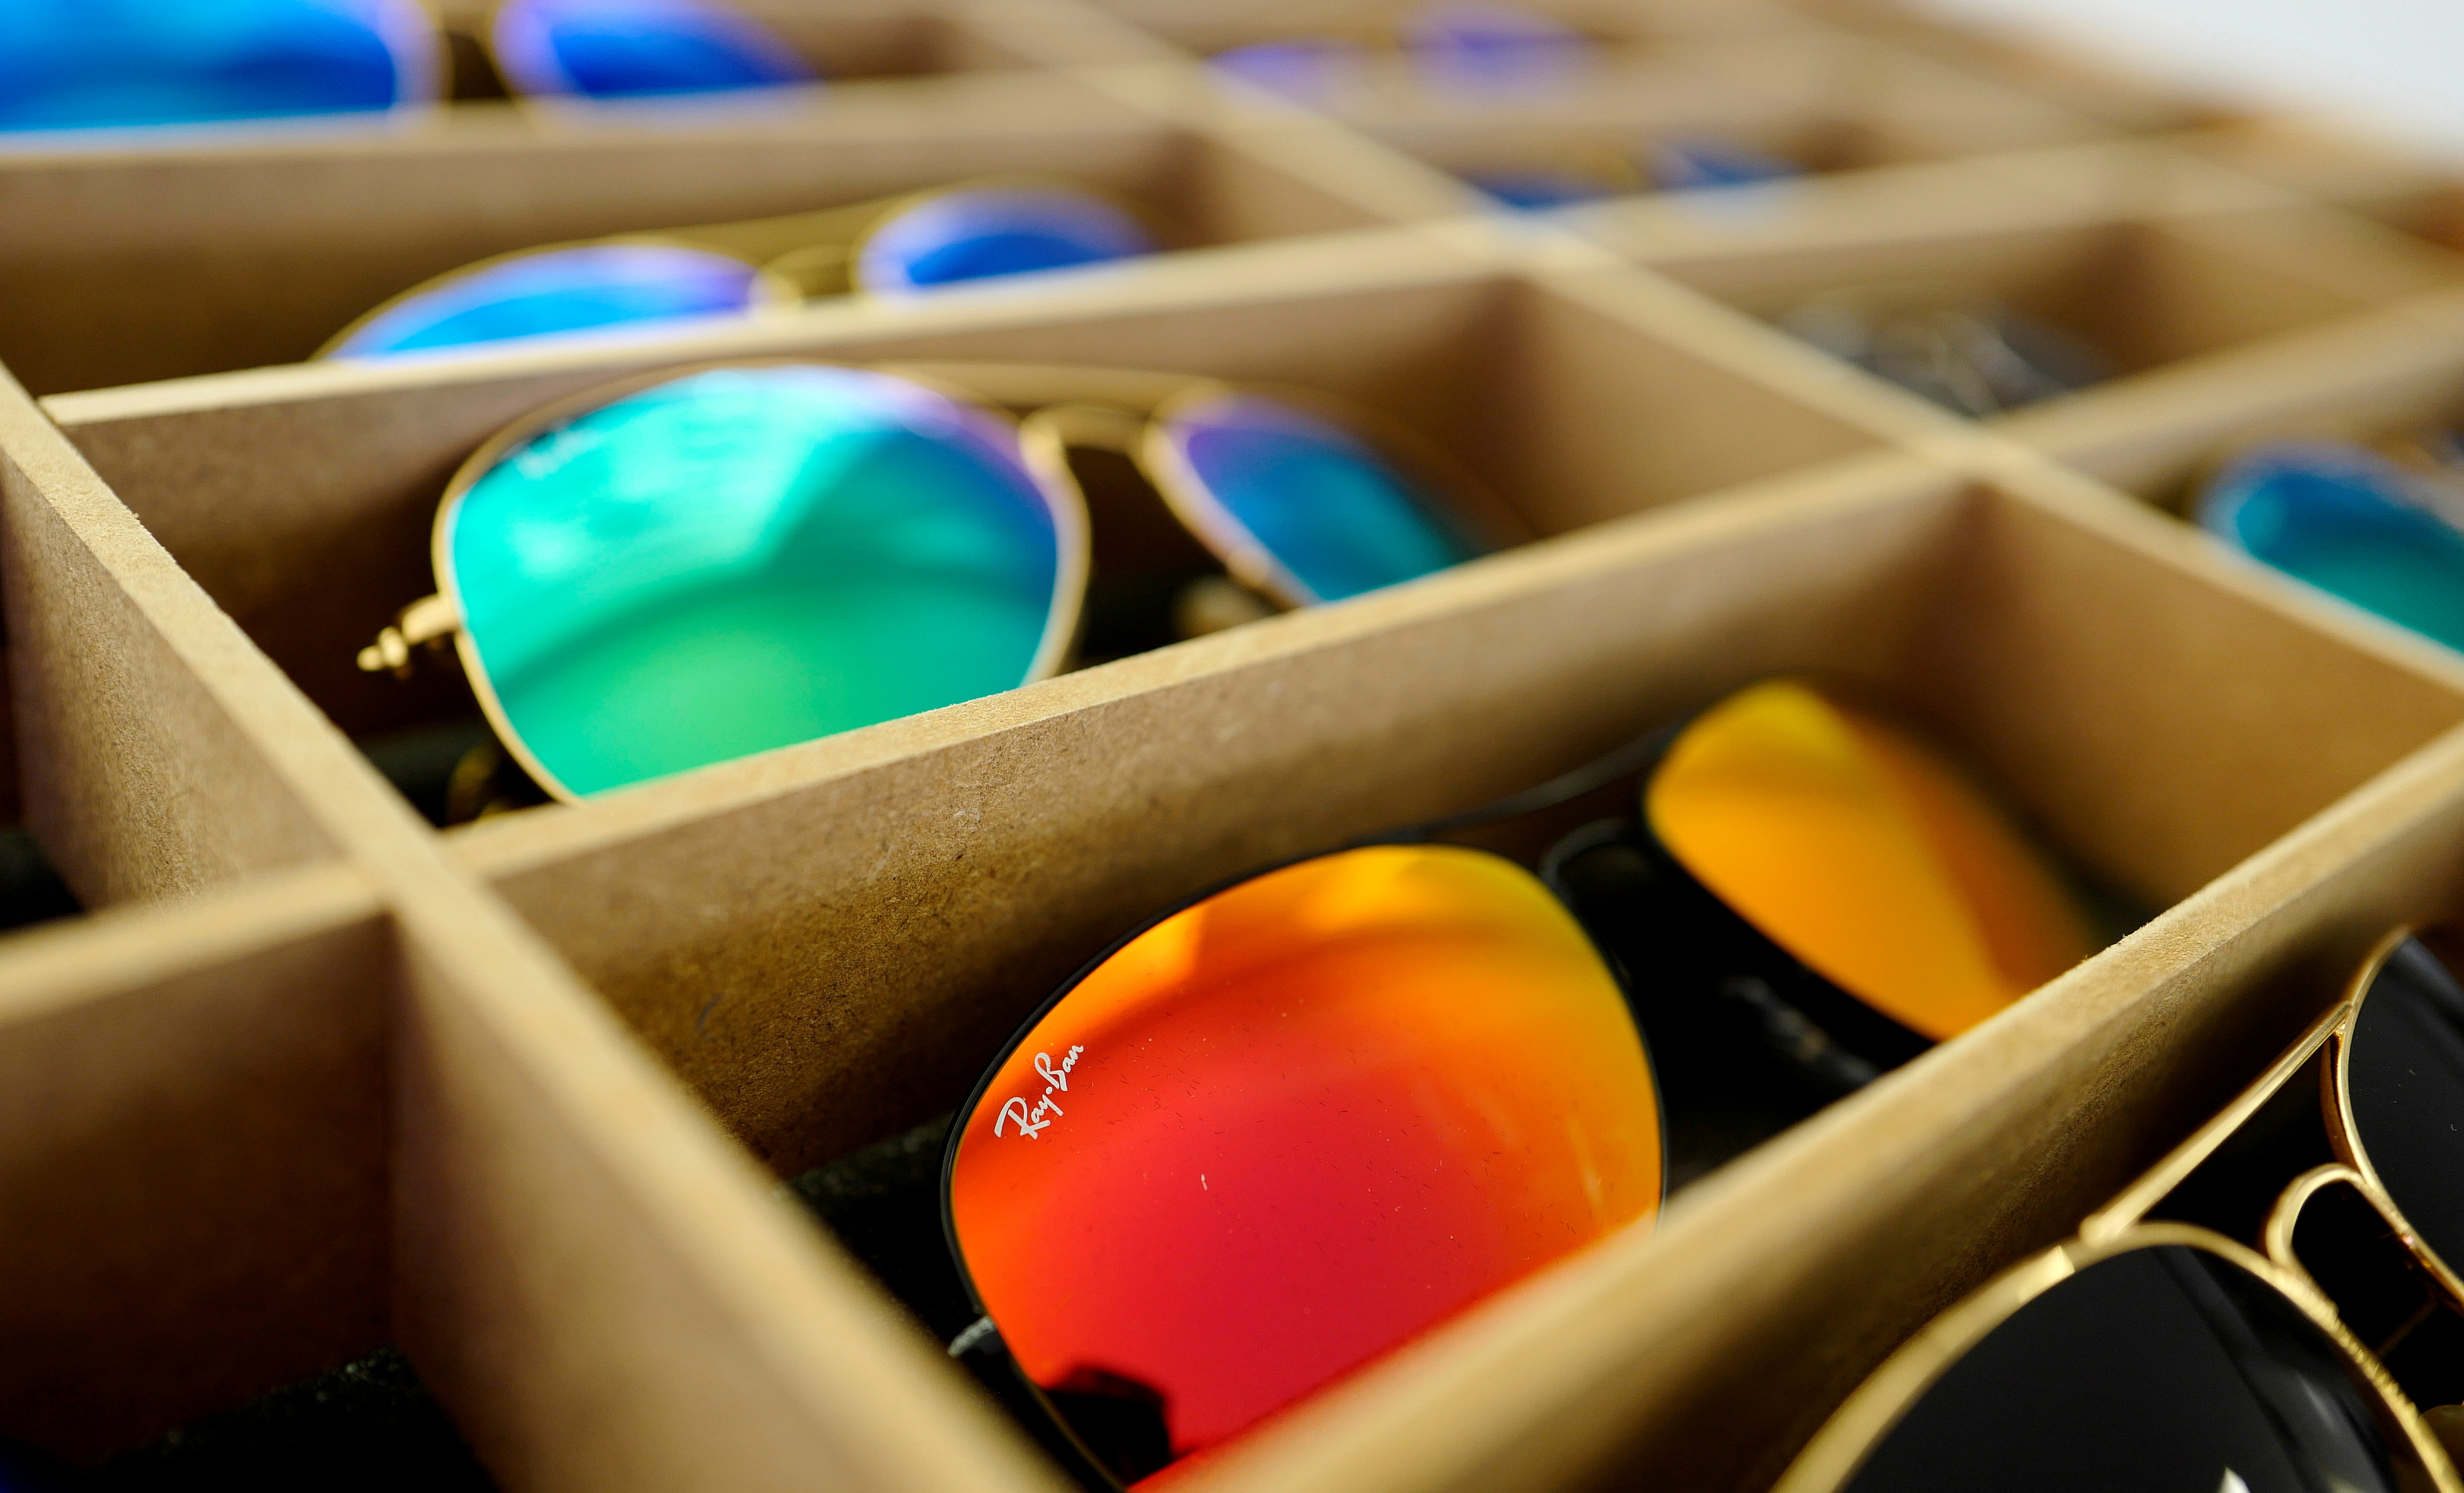 Sunglasses from Ray-Ban are on display at a optician shop in Hanau near Frankfurt, Germany, March 18, 2016. REUTERS/Kai Pfaffenbach